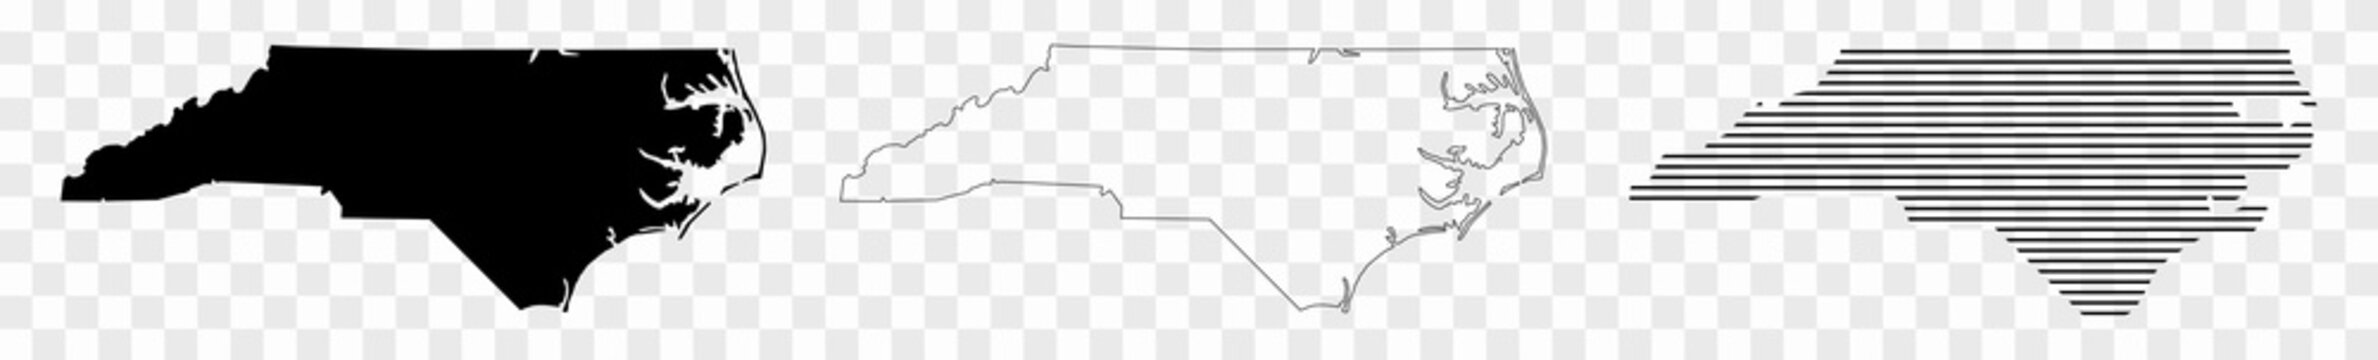 North Carolina Map Black | State Border | United States | US America | Transparent Isolated | Variations